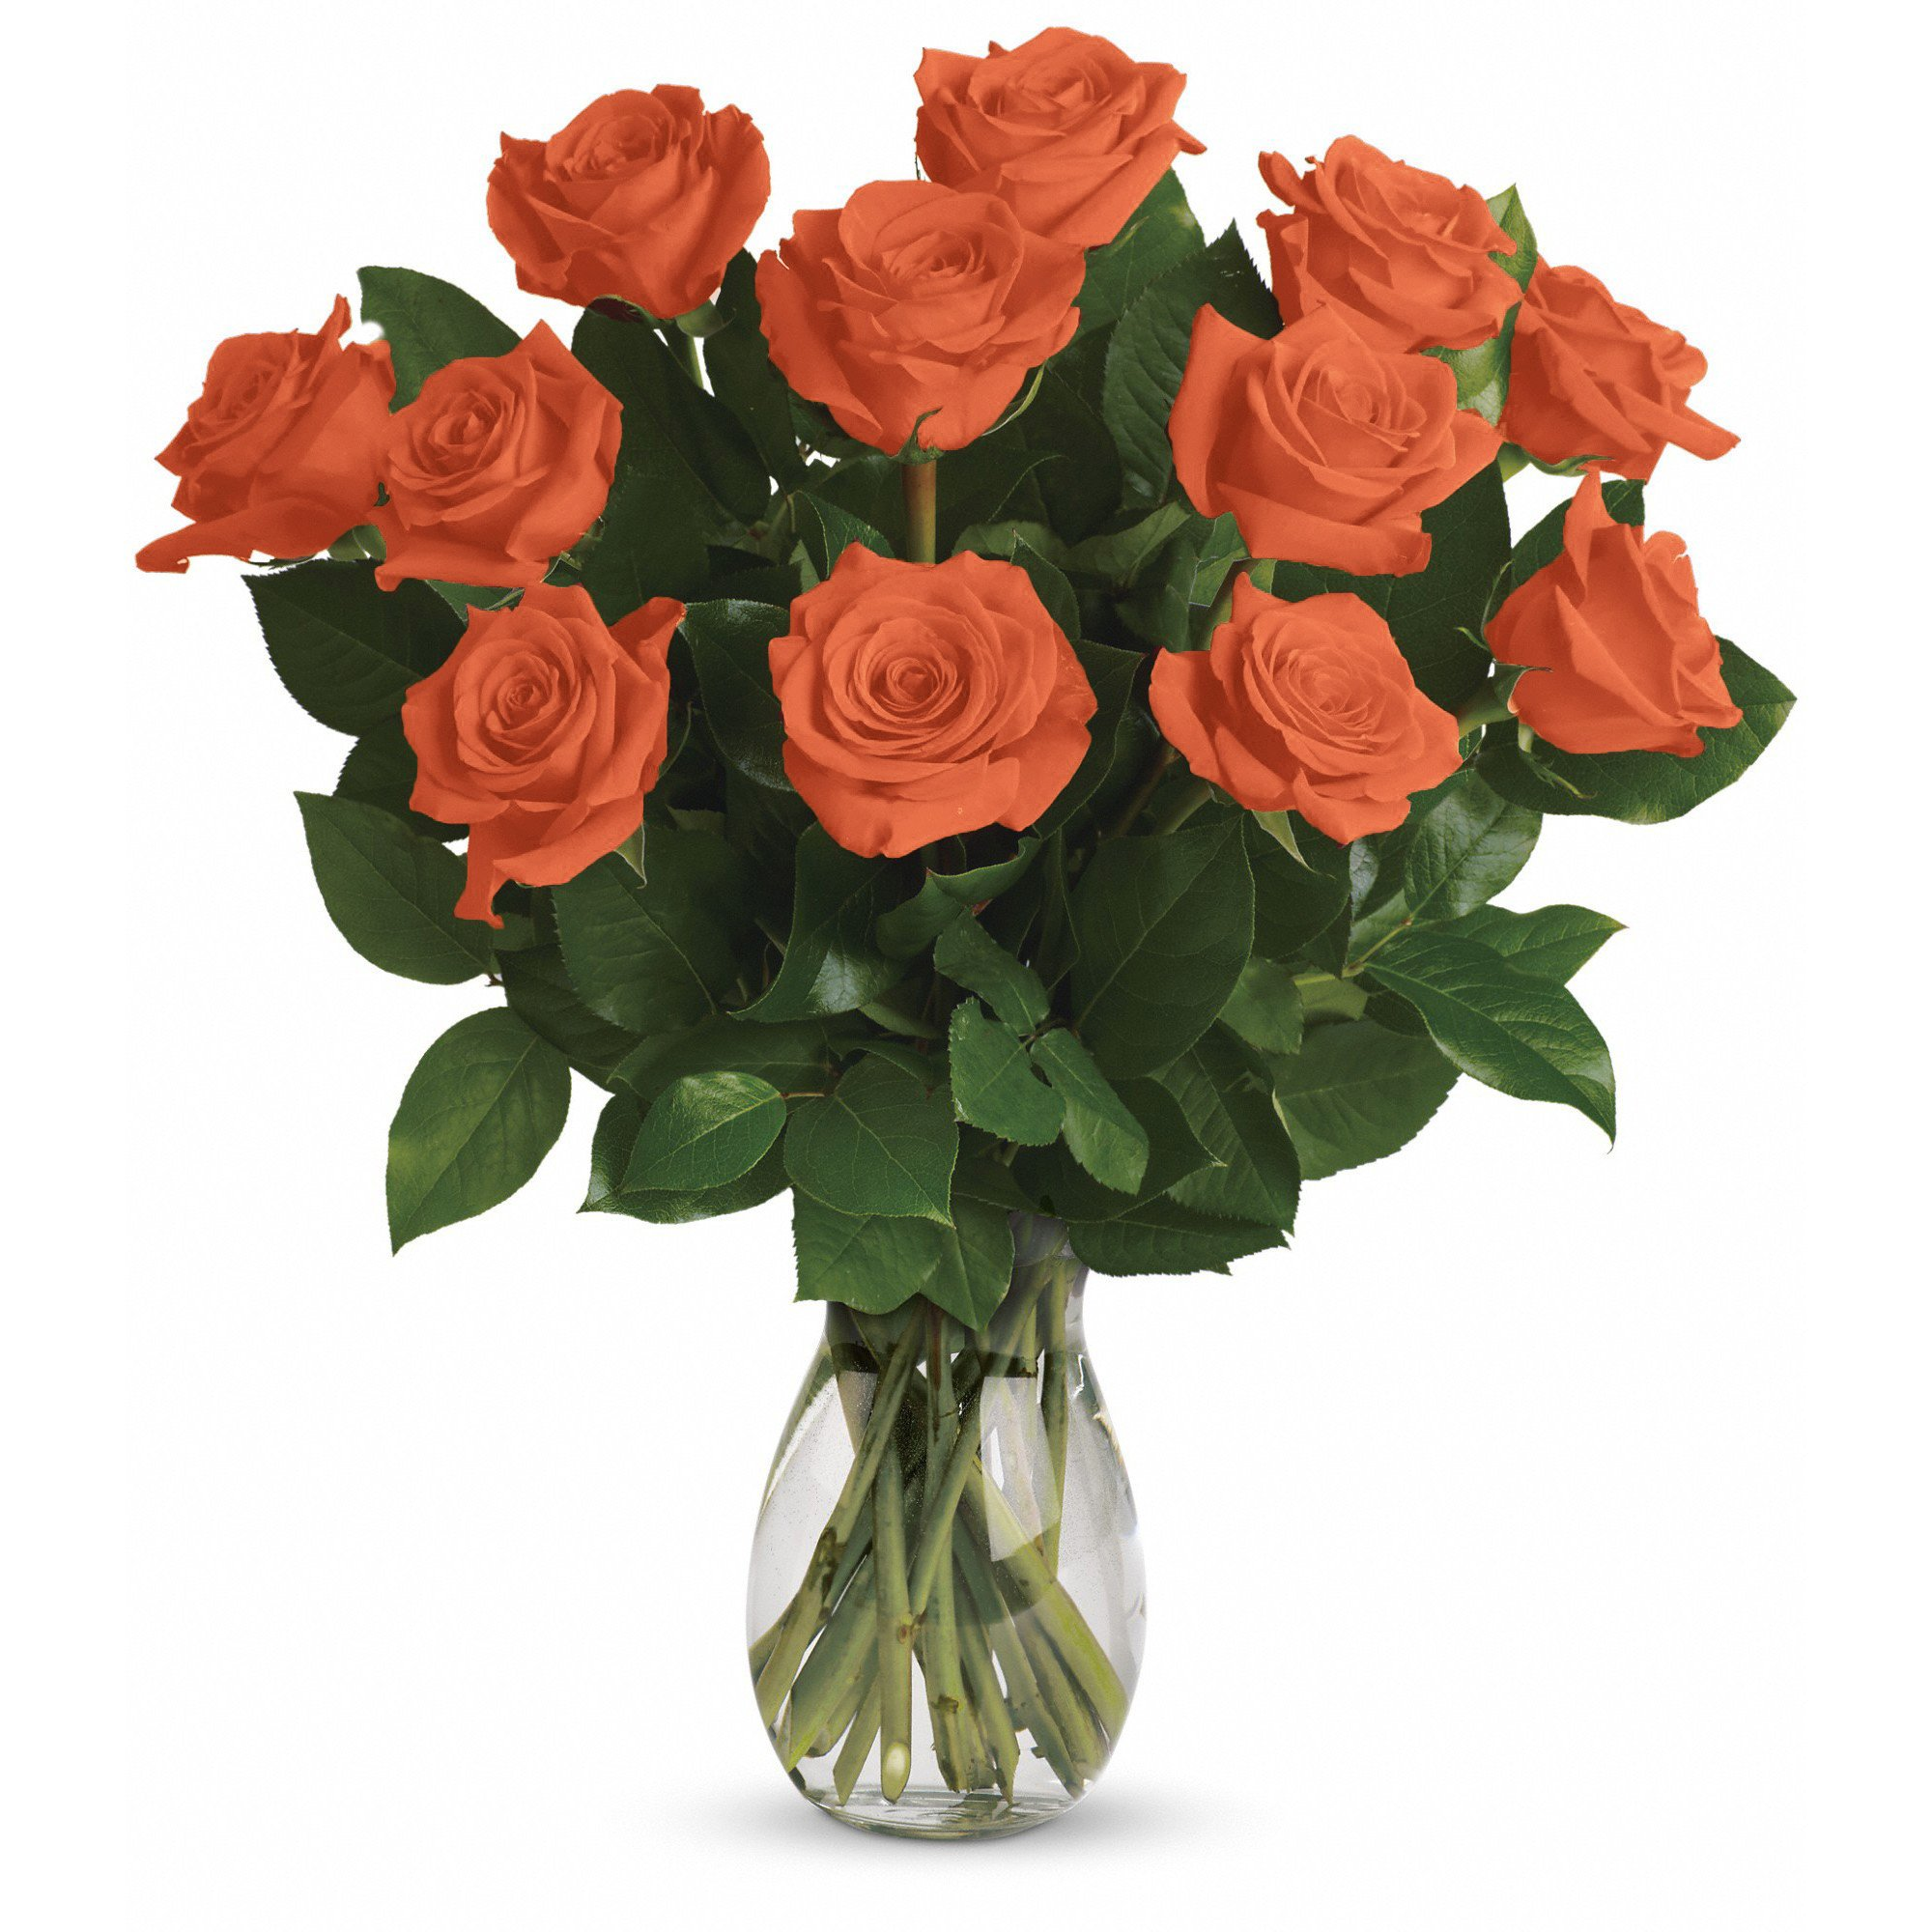 Farm Direct Rose Bouquet of 12 Fresh Cut Roses with Vase (Orange)